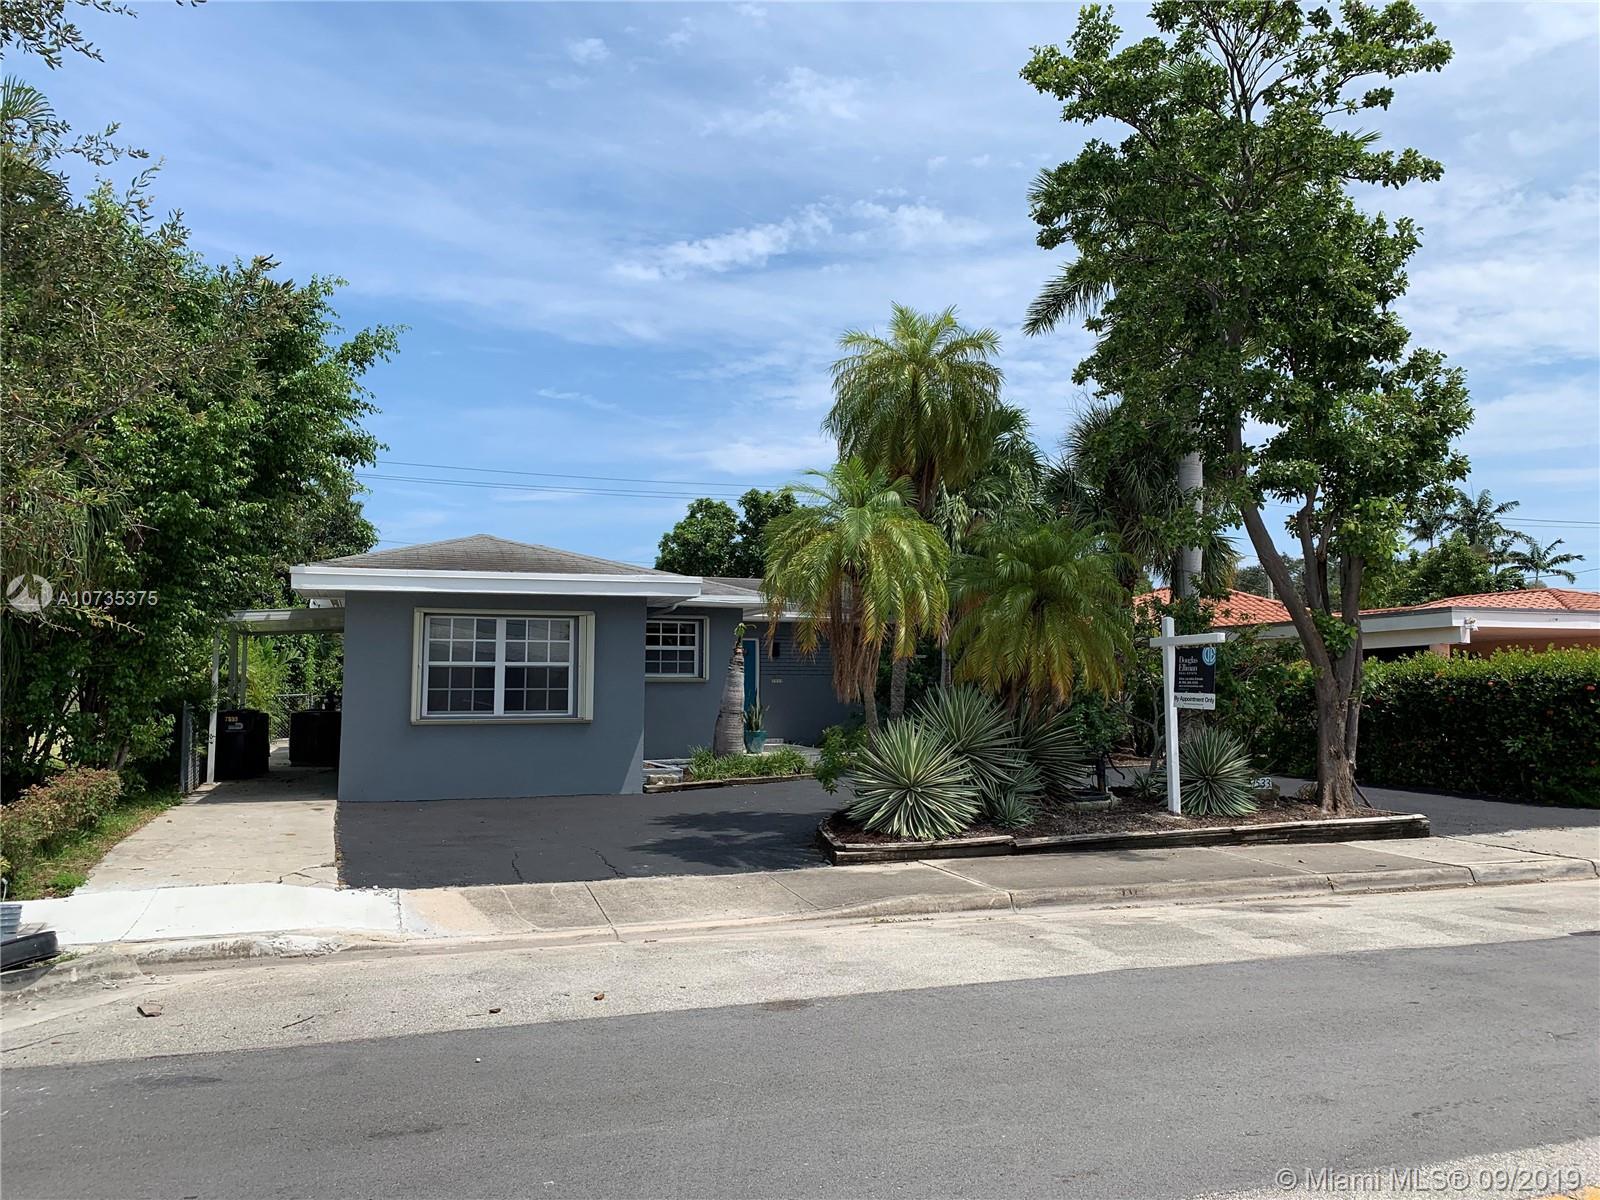 7533 Mutiny Ave - North Bay Village, Florida